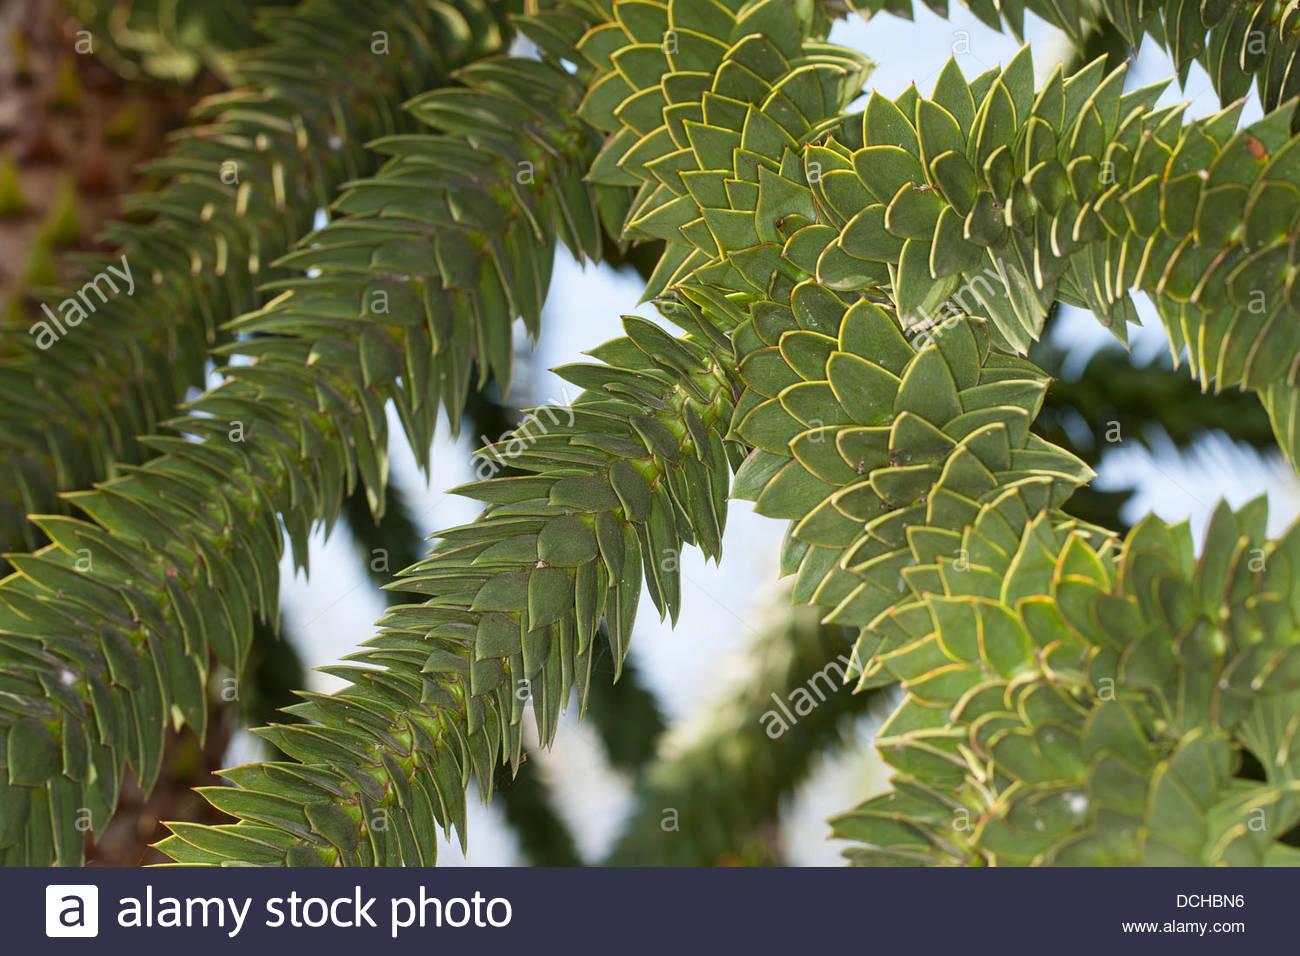 Monkey Puzzle Tree, Monkey Tail Tree, Chilean Pine, Chilenische.